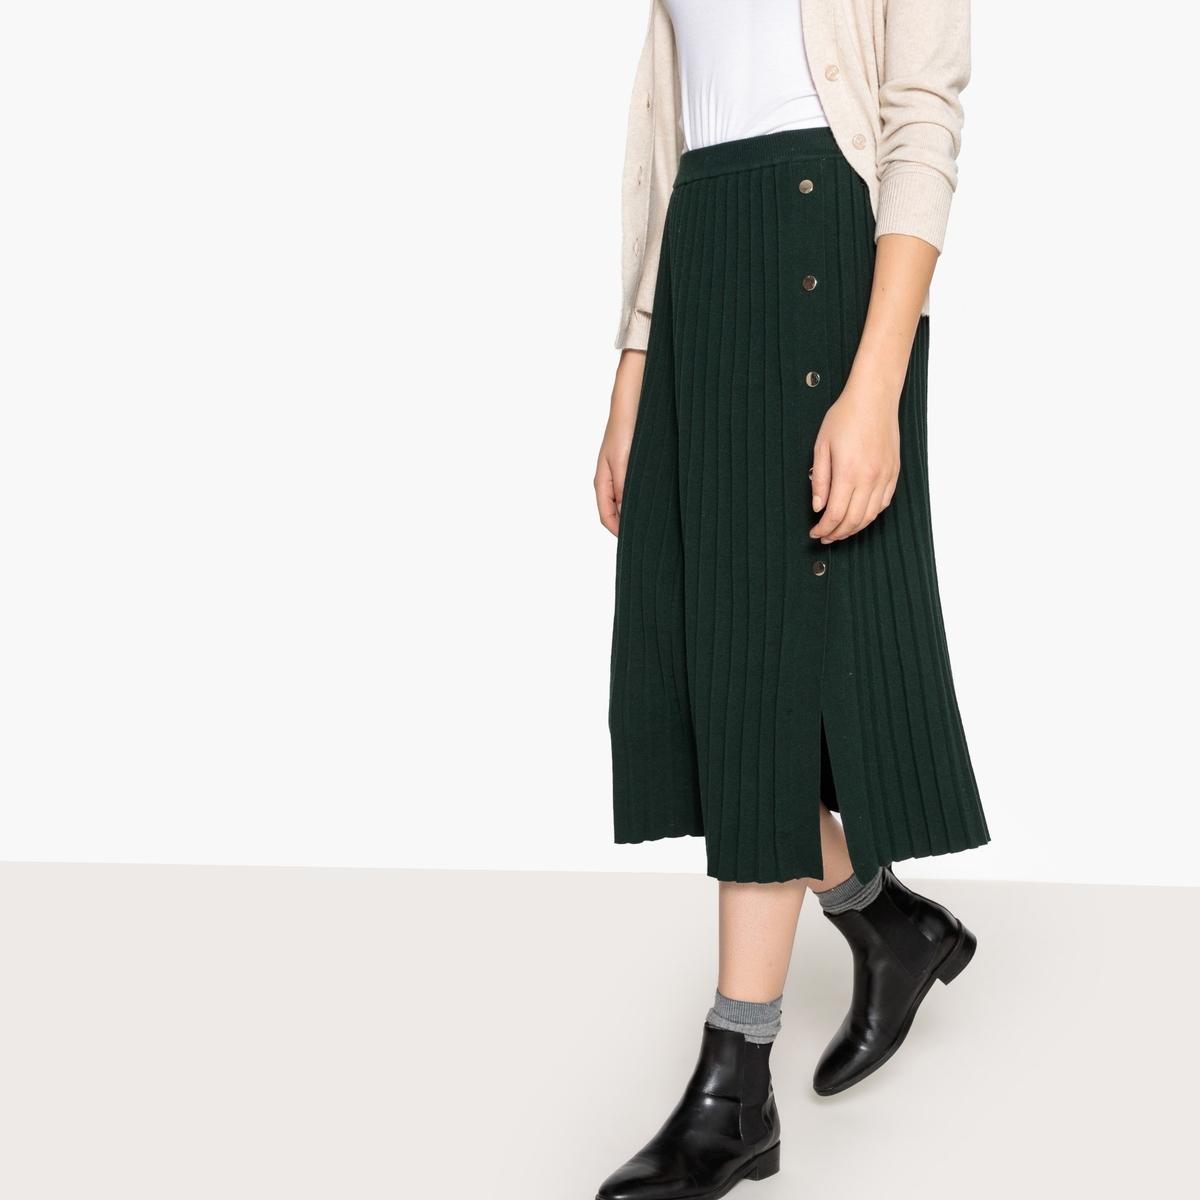 Falda semilarga de punto tricot plisado